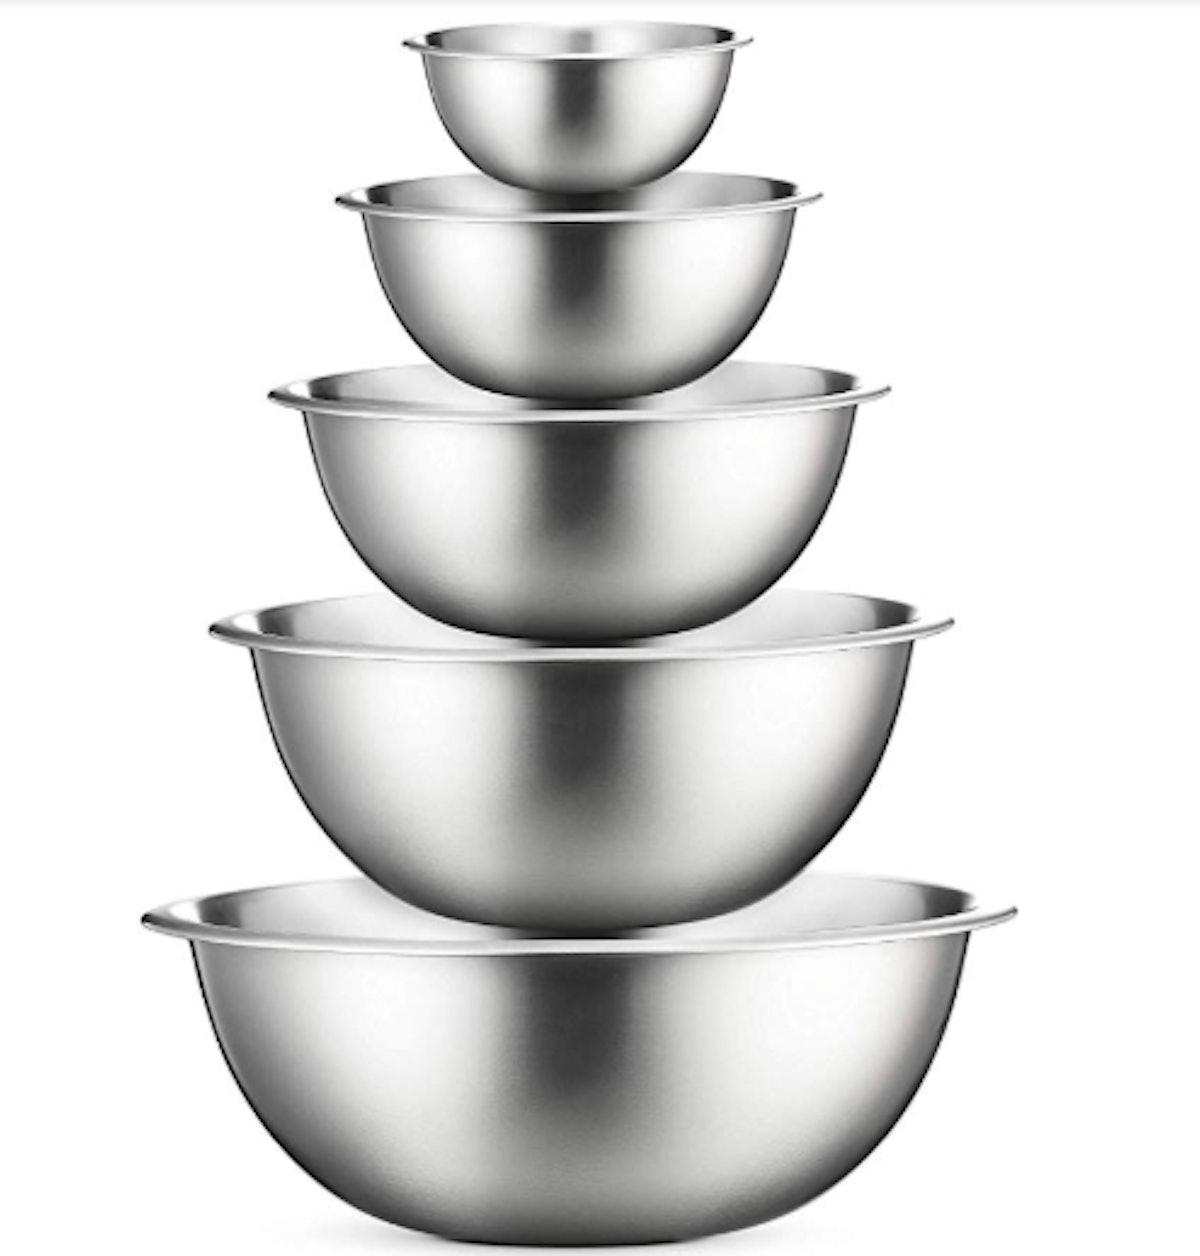 FineDine Premium Stainless Steel Mixing Bowls (5-Piece Set)